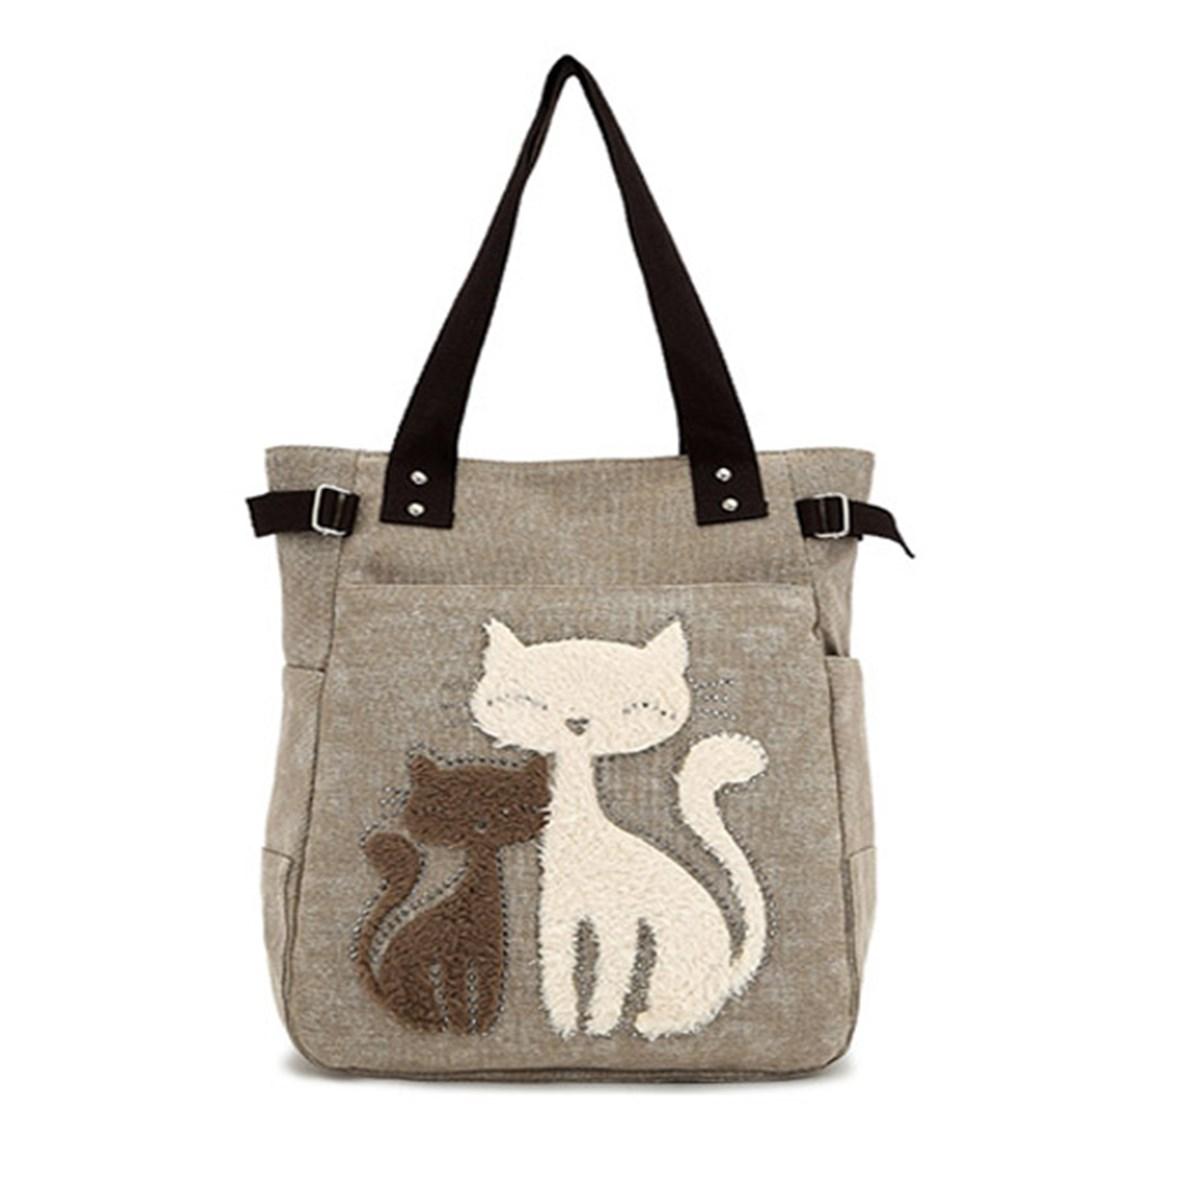 2015 Women Handbags Canvas Cute Cat  Appliques Portable Small Shoulder Bags Lady Shopping Zipper Totes 3 Colors Free shipping<br><br>Aliexpress